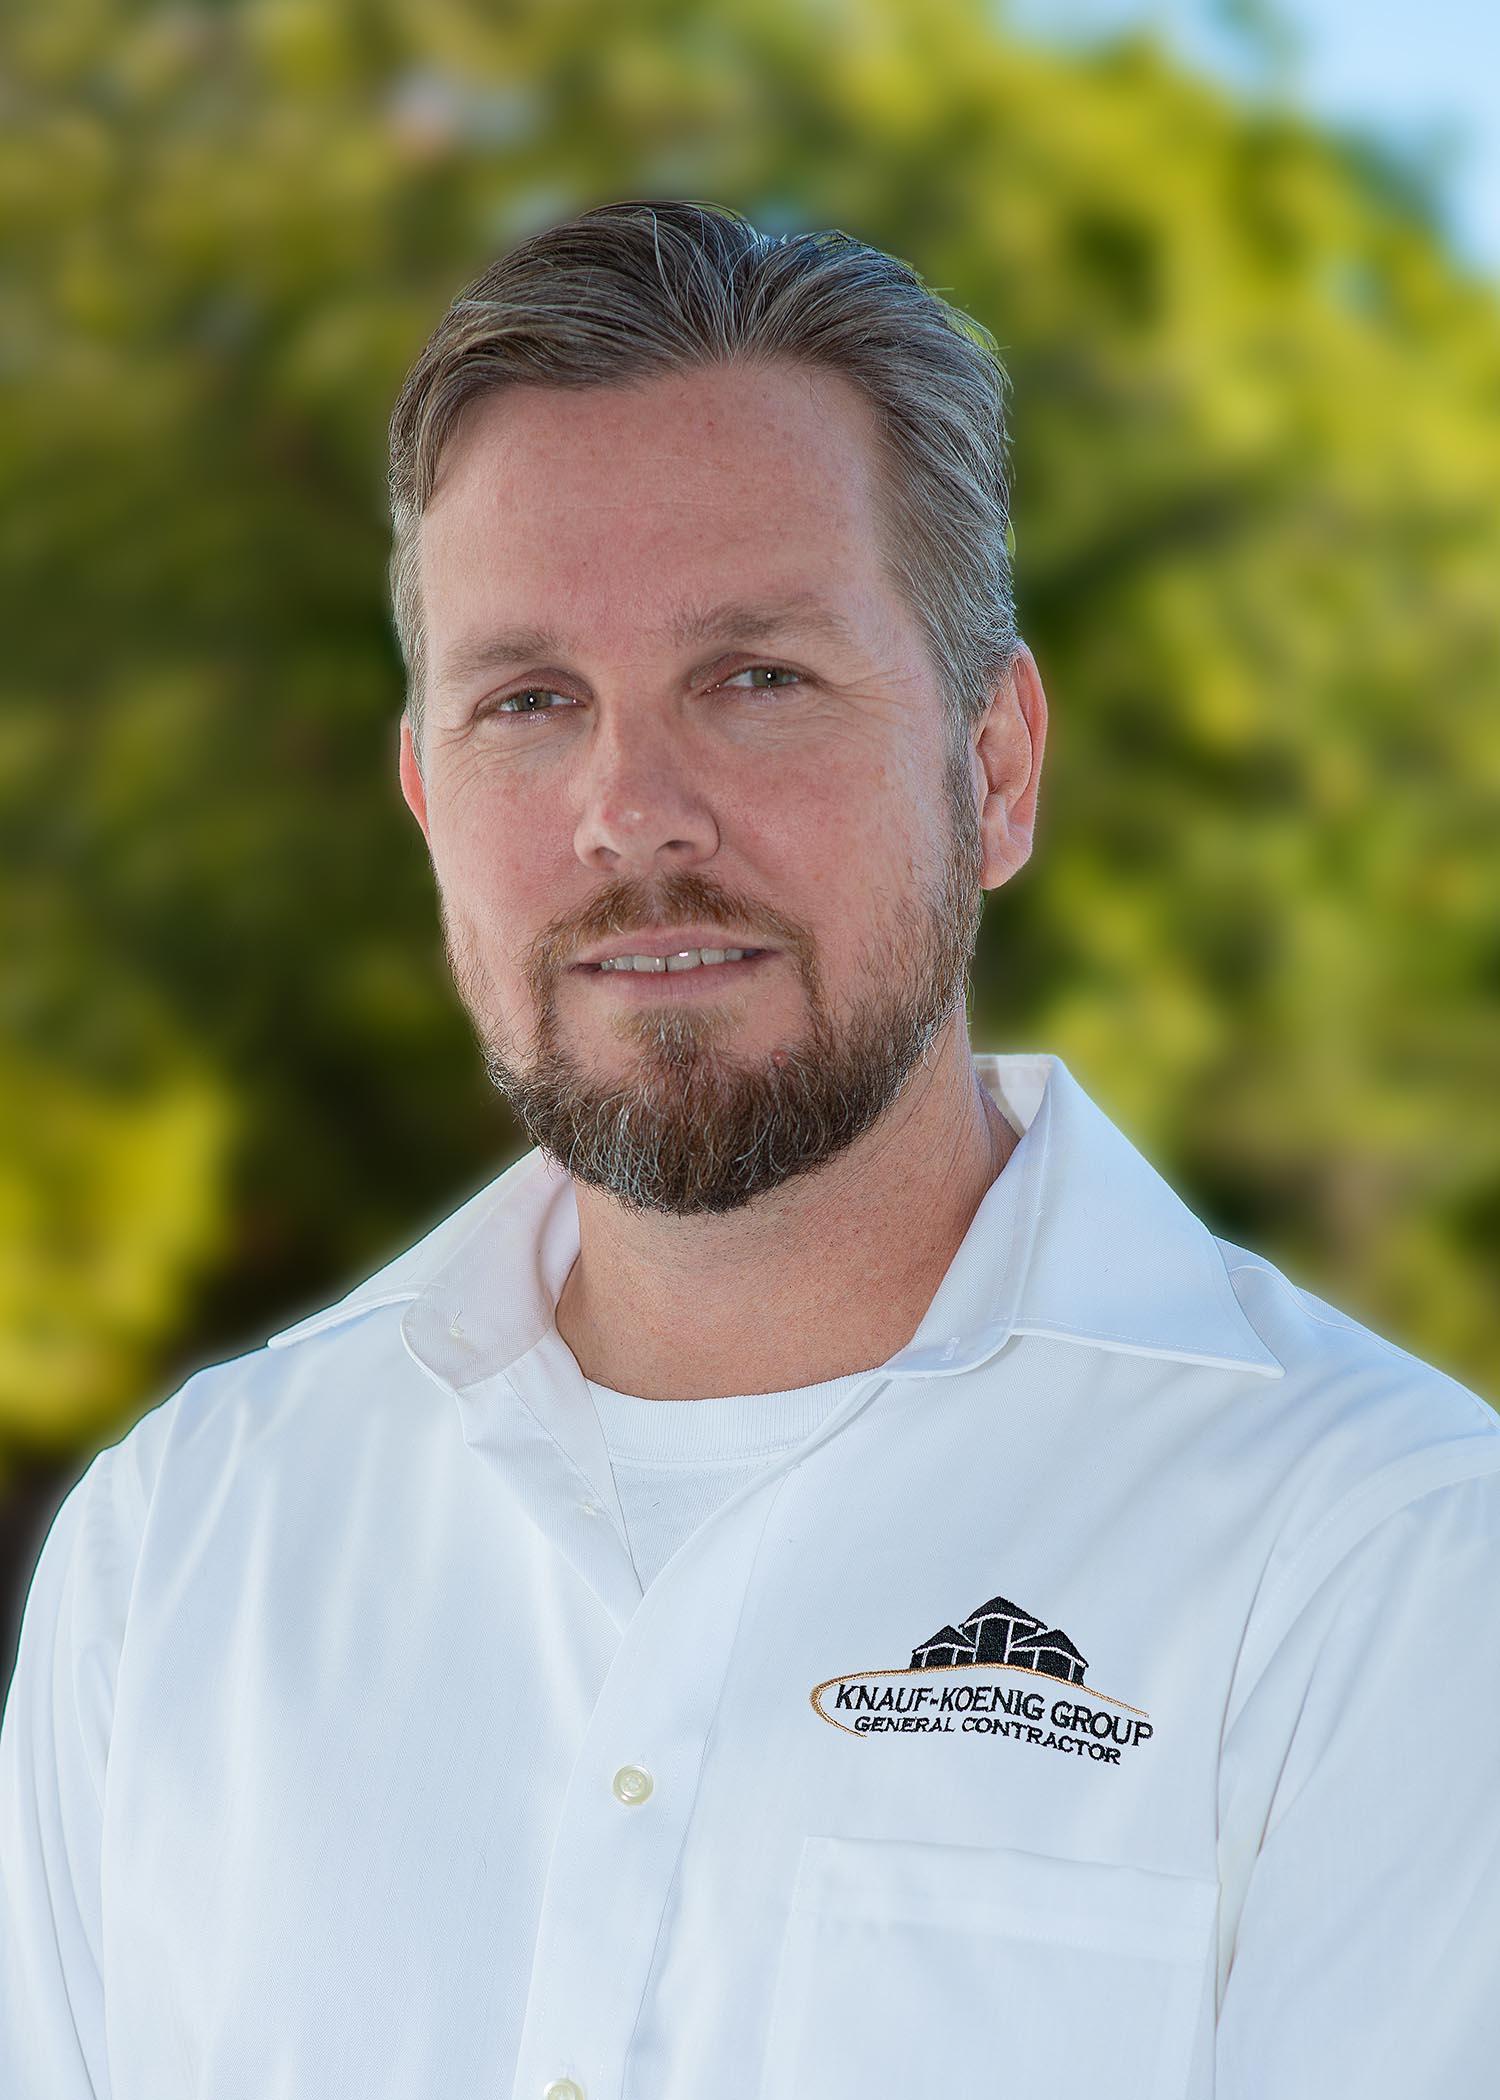 Jeff Bobay | Knauf-Koenig Group - Naples, Florida General Contractor